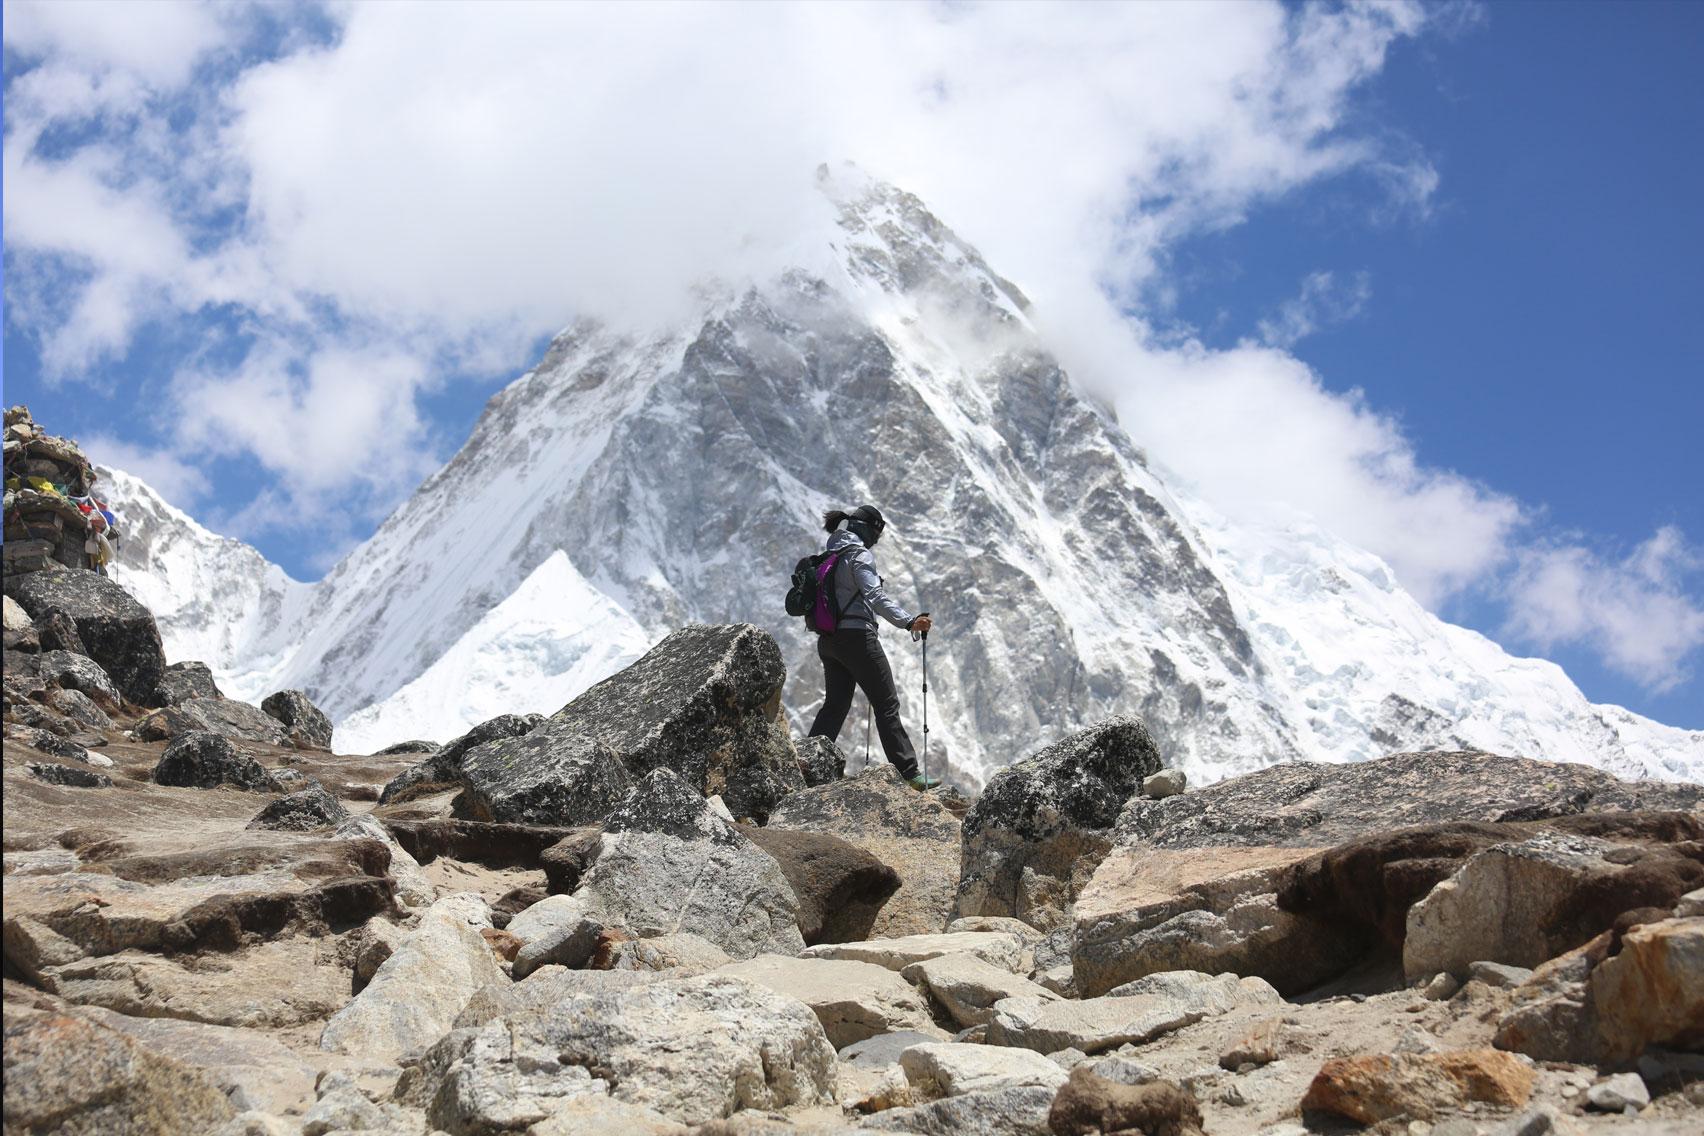 Day 12: Trek from Lobuche (4980m) to Phortse (7hrs, 3950m)